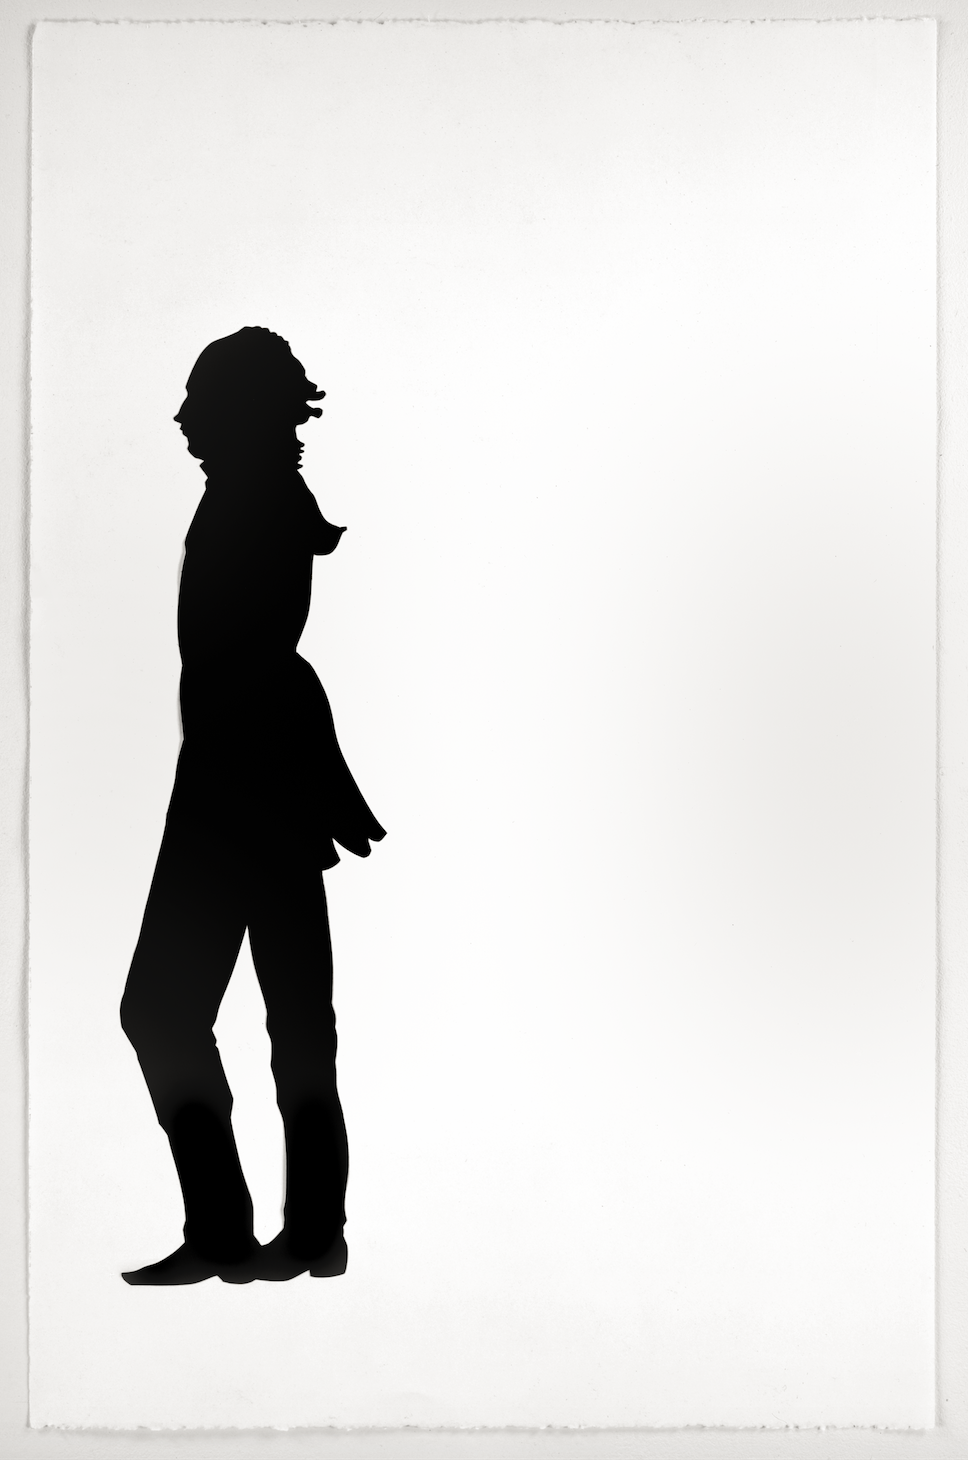 968x1460 5.5 Life In Those Shadows! Kara Walker's Post Cinematic